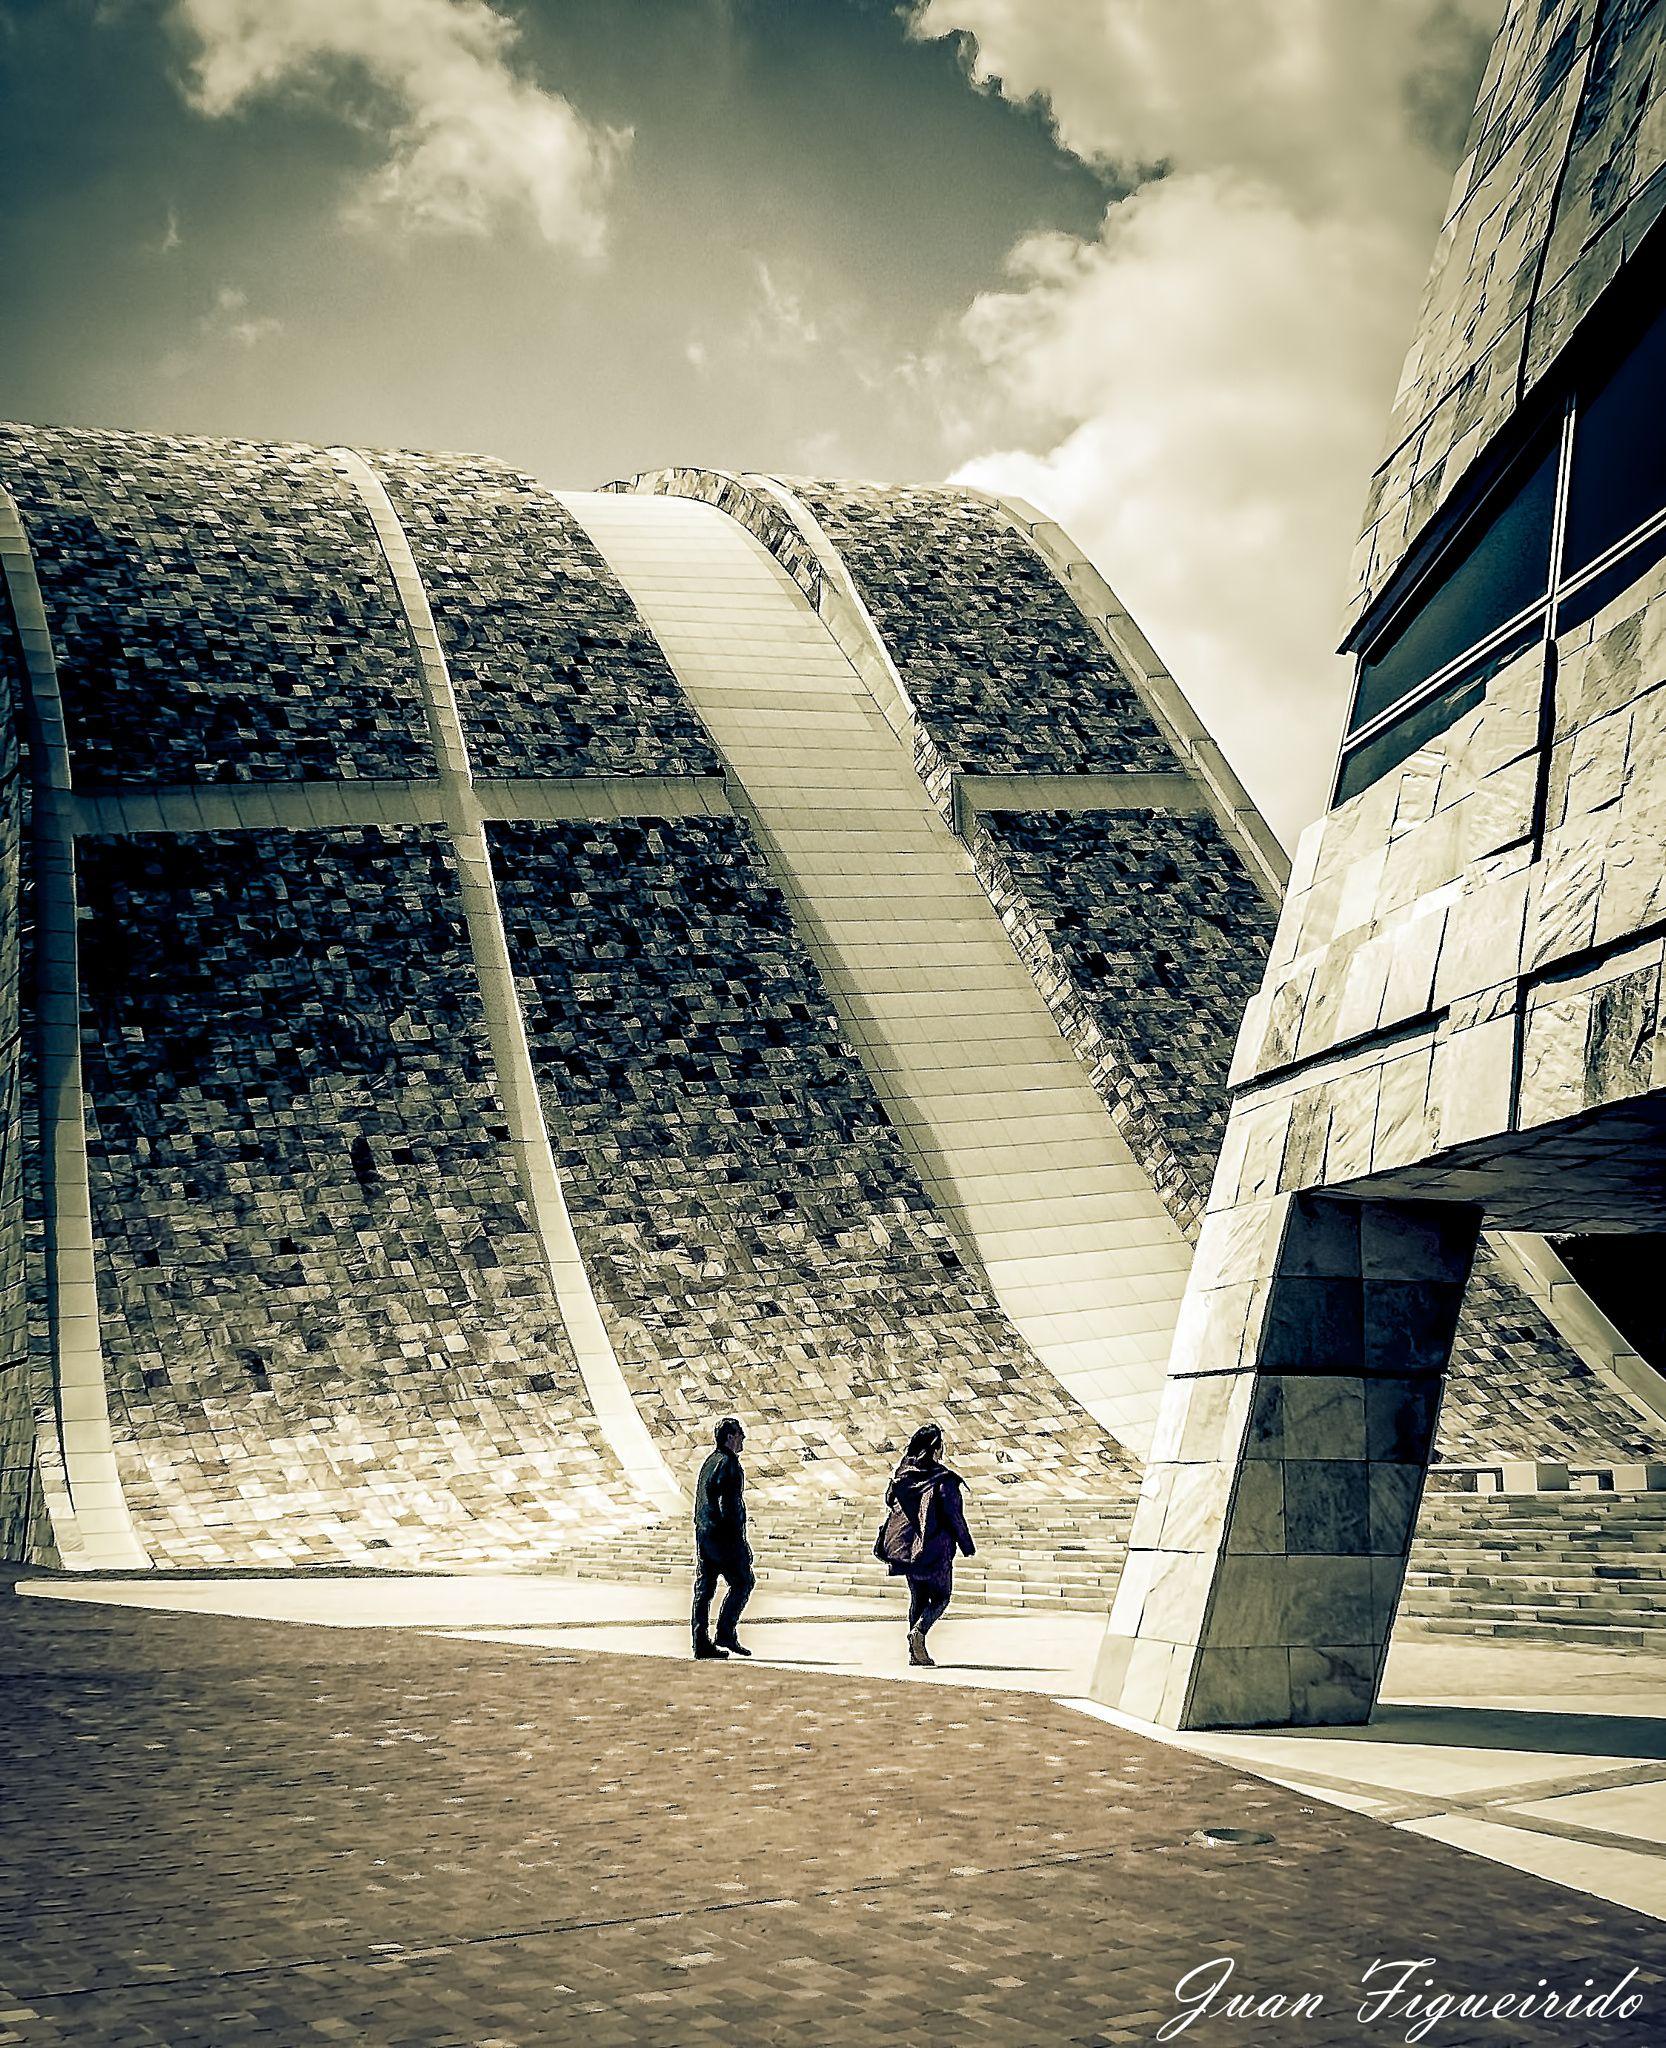 Santiago De Compostela Arquitectura16 Vsco Journal Guiding  # Muebles Sirvent Vigo